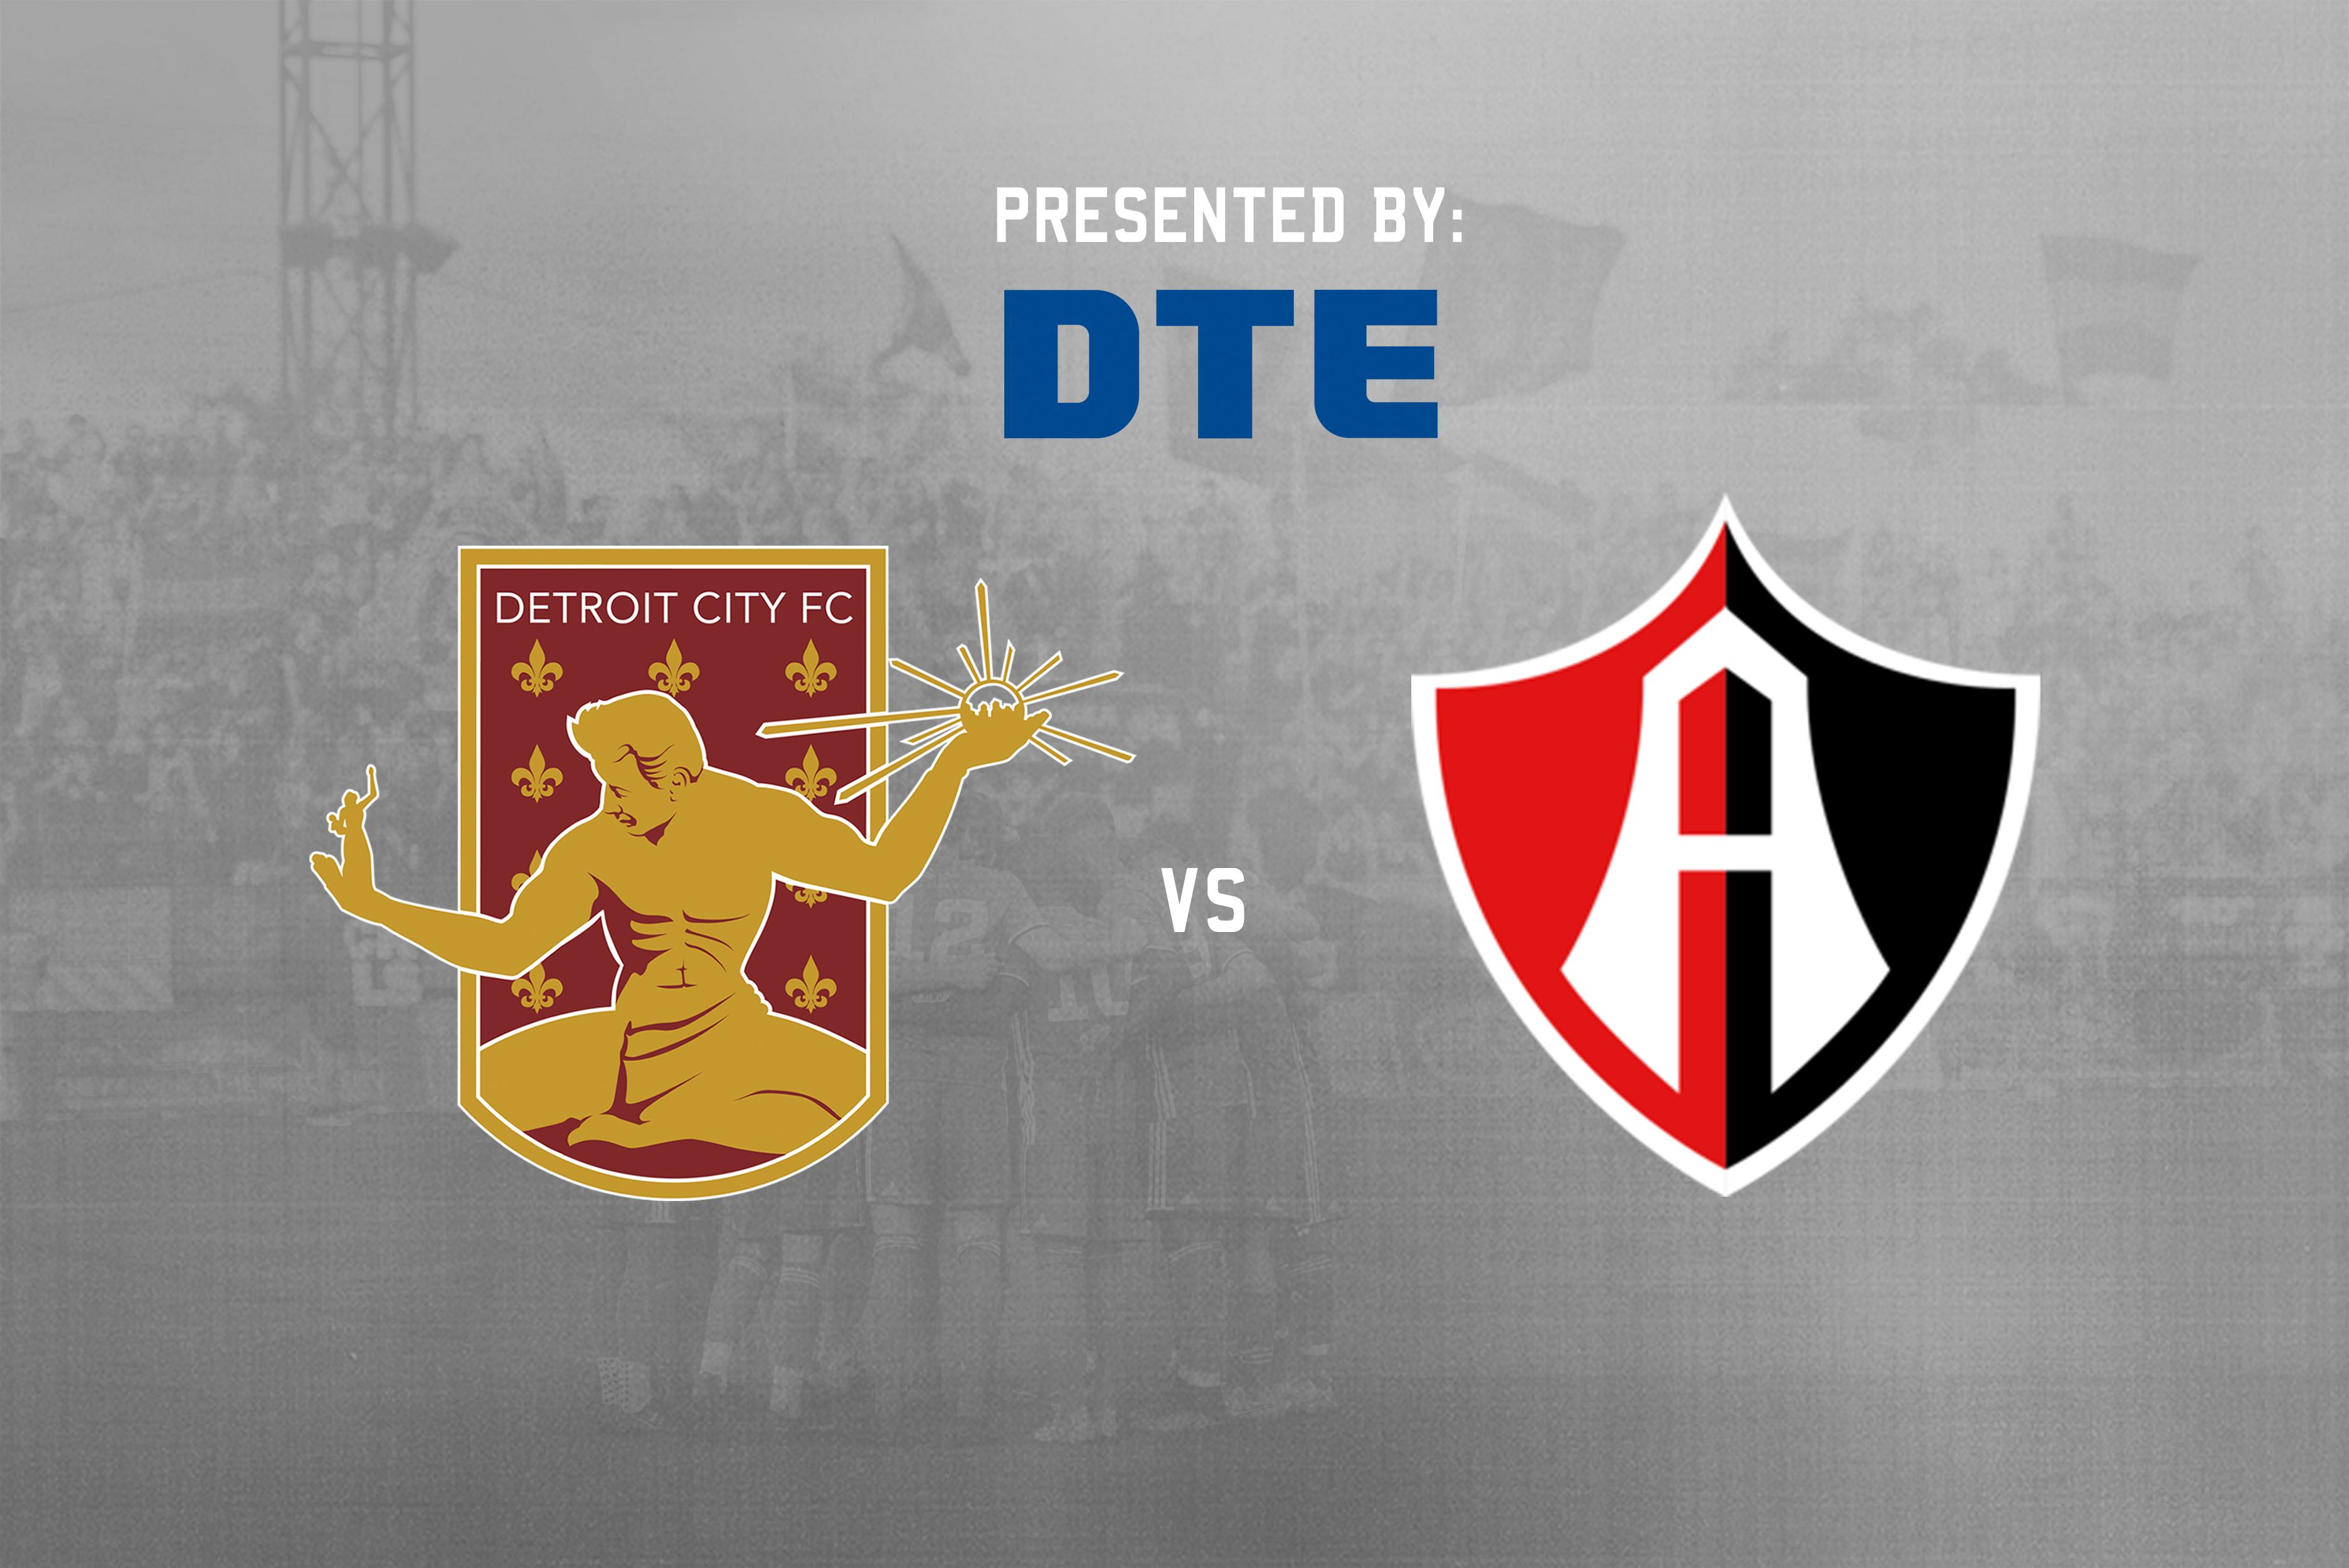 ca5e378fe96 Detroit City FC announces international friendly against Club Atlas of Liga  MX on September 7